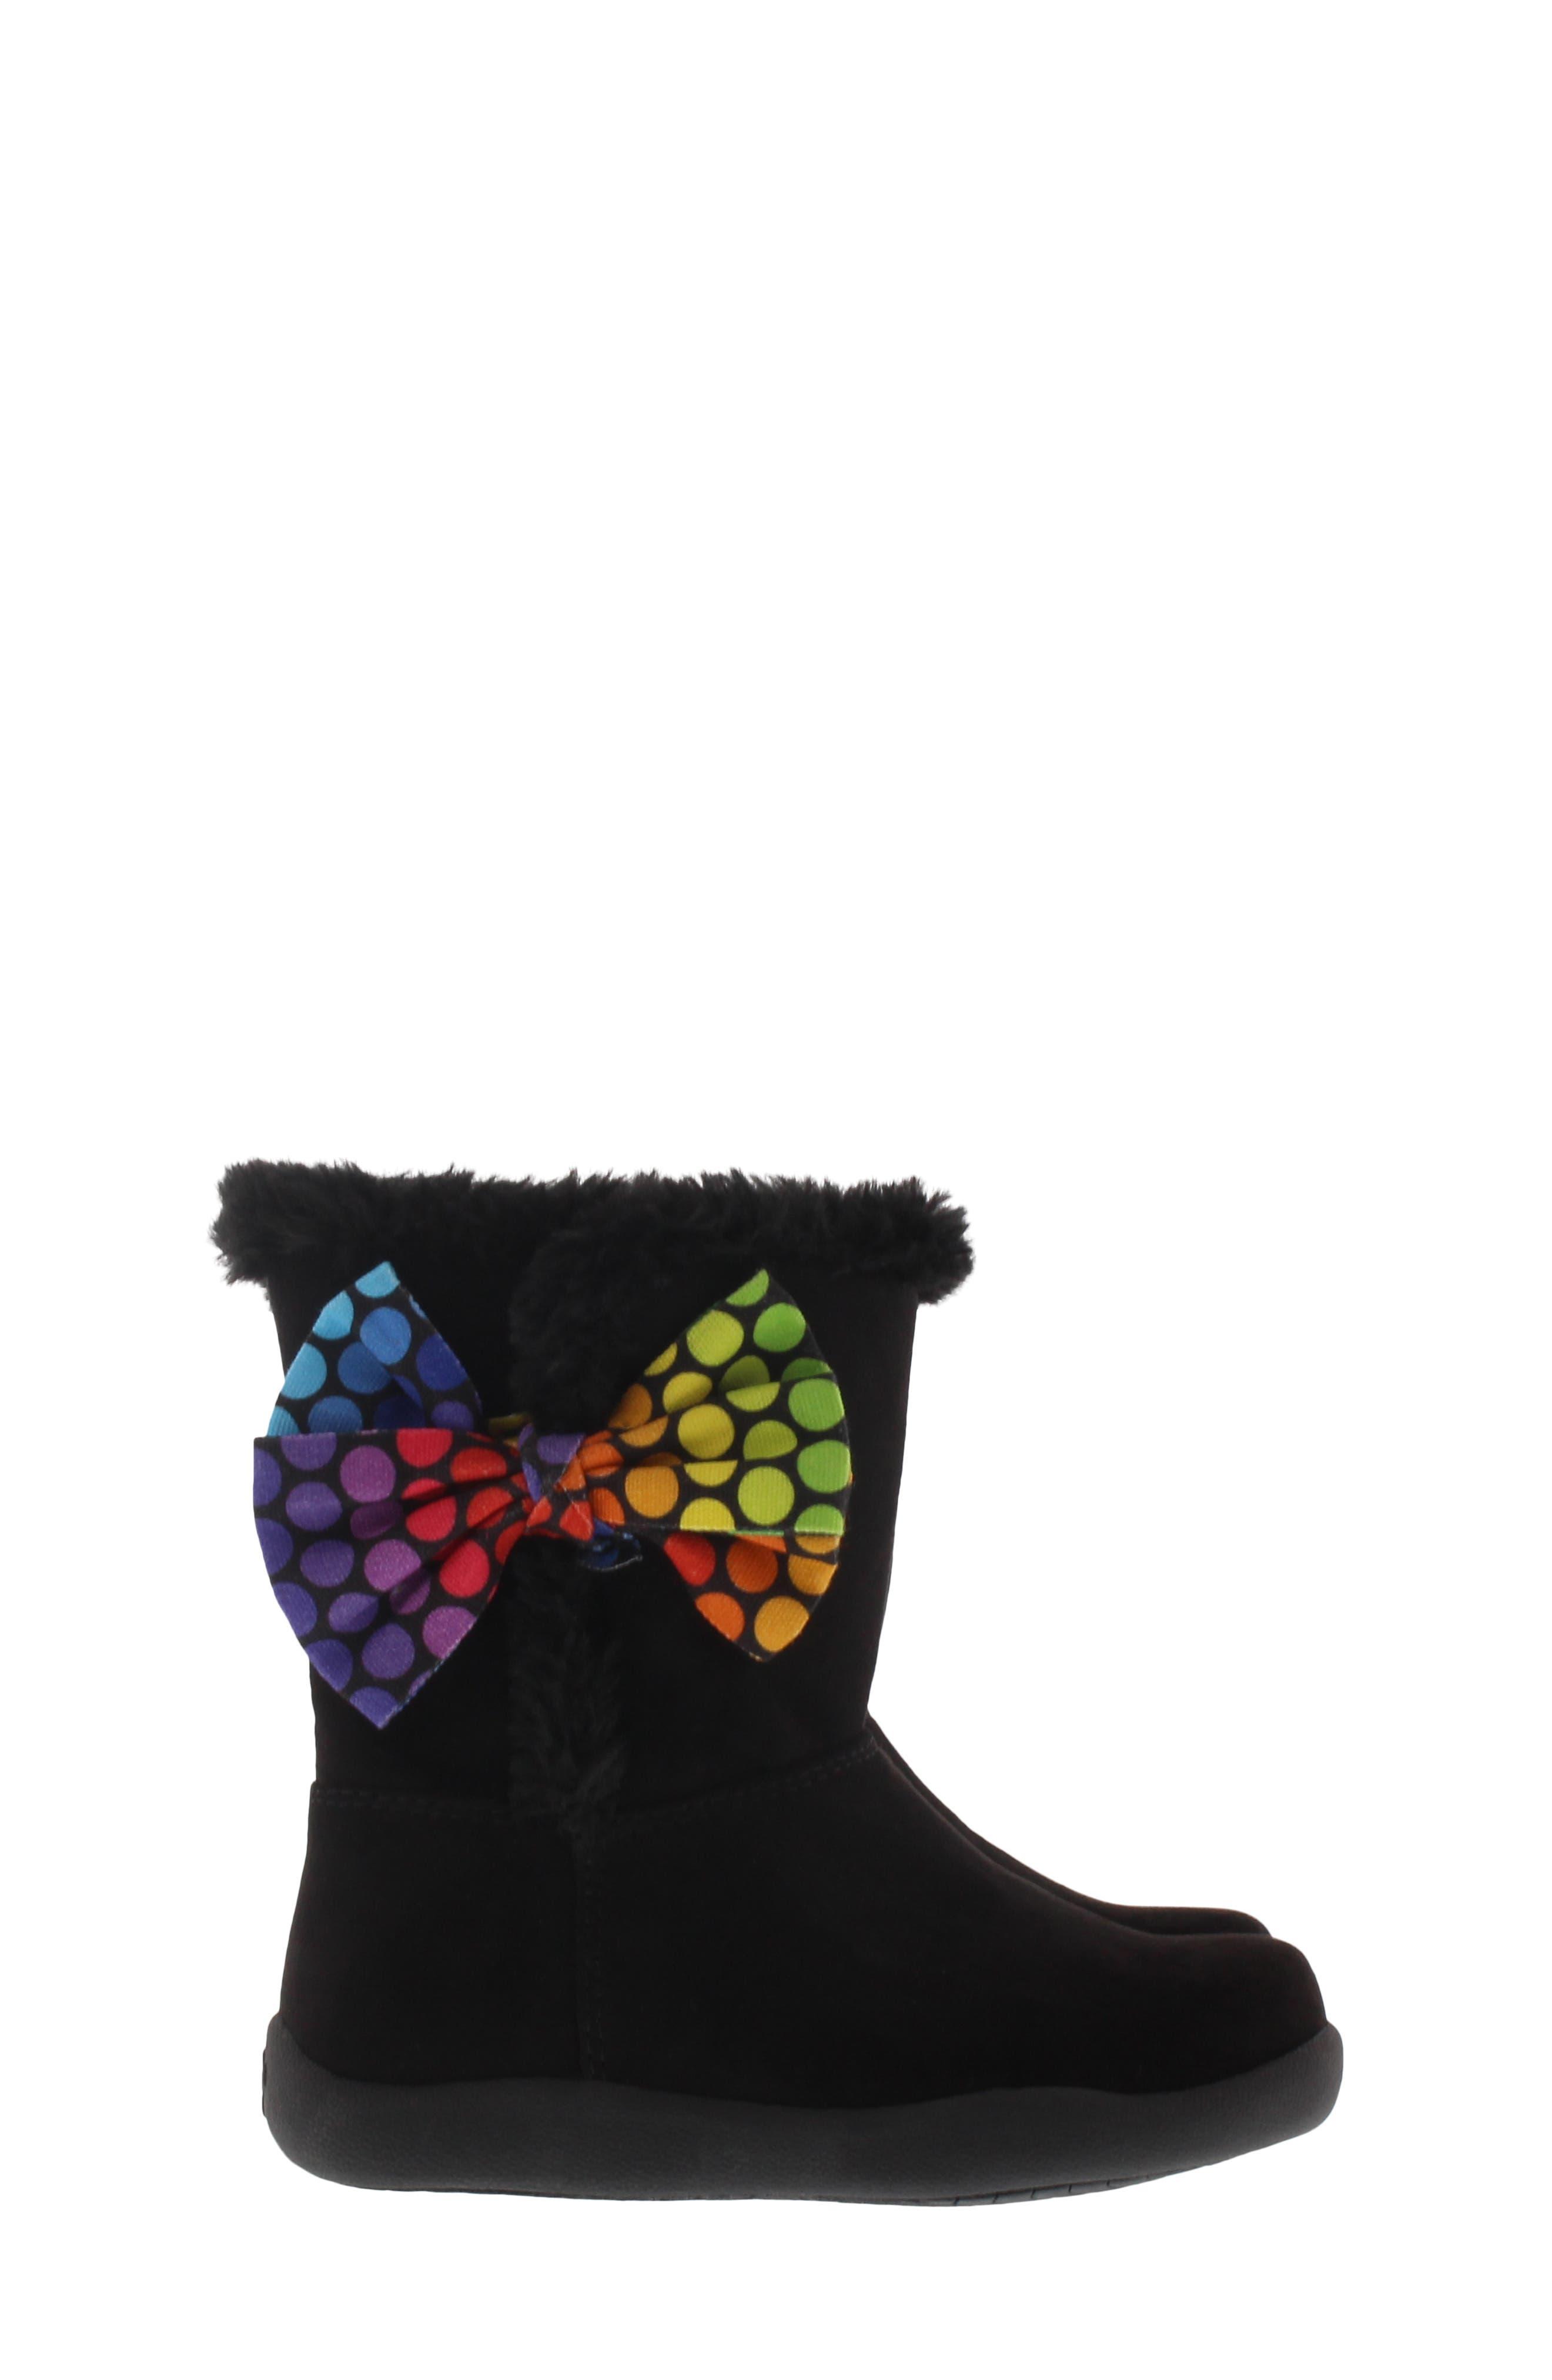 CHOOZE, Wish Faux Fur Lined Boot, Alternate thumbnail 3, color, BLACK